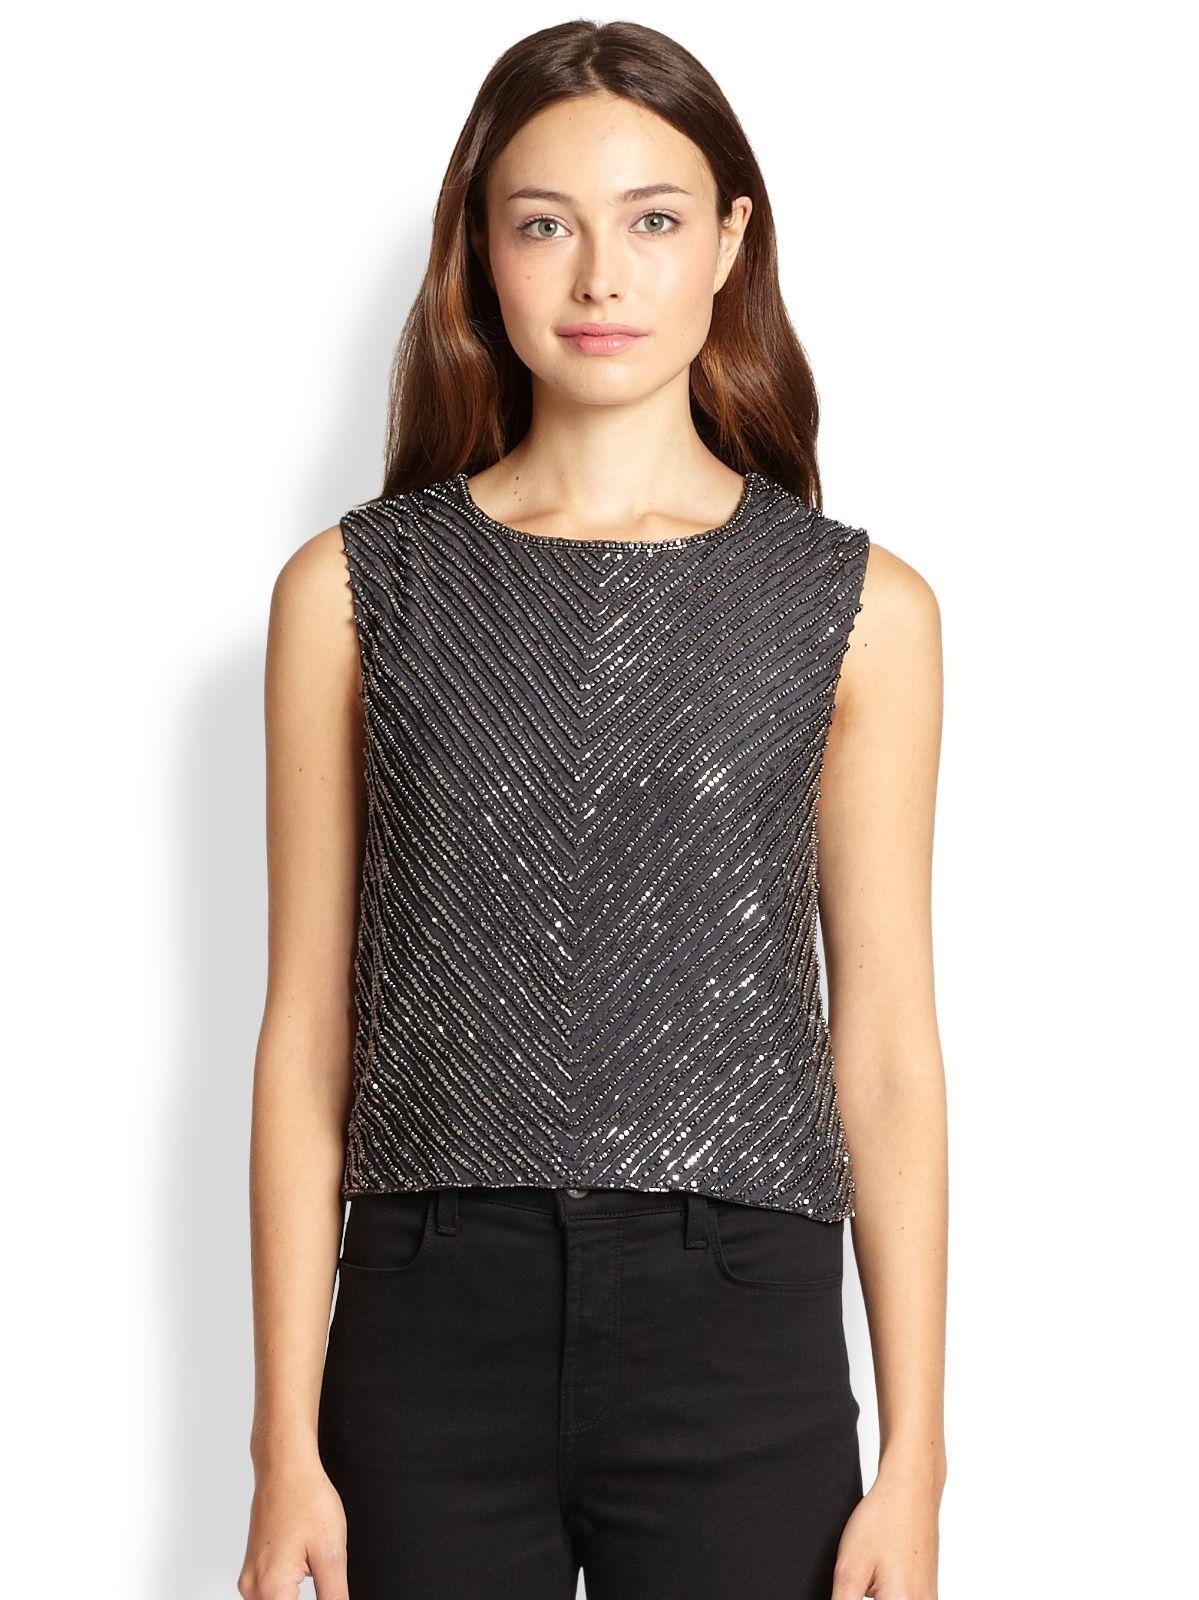 Karina Grimaldi Miriam Gunmetal Silk Beaded Top Blouse NWT  S Small